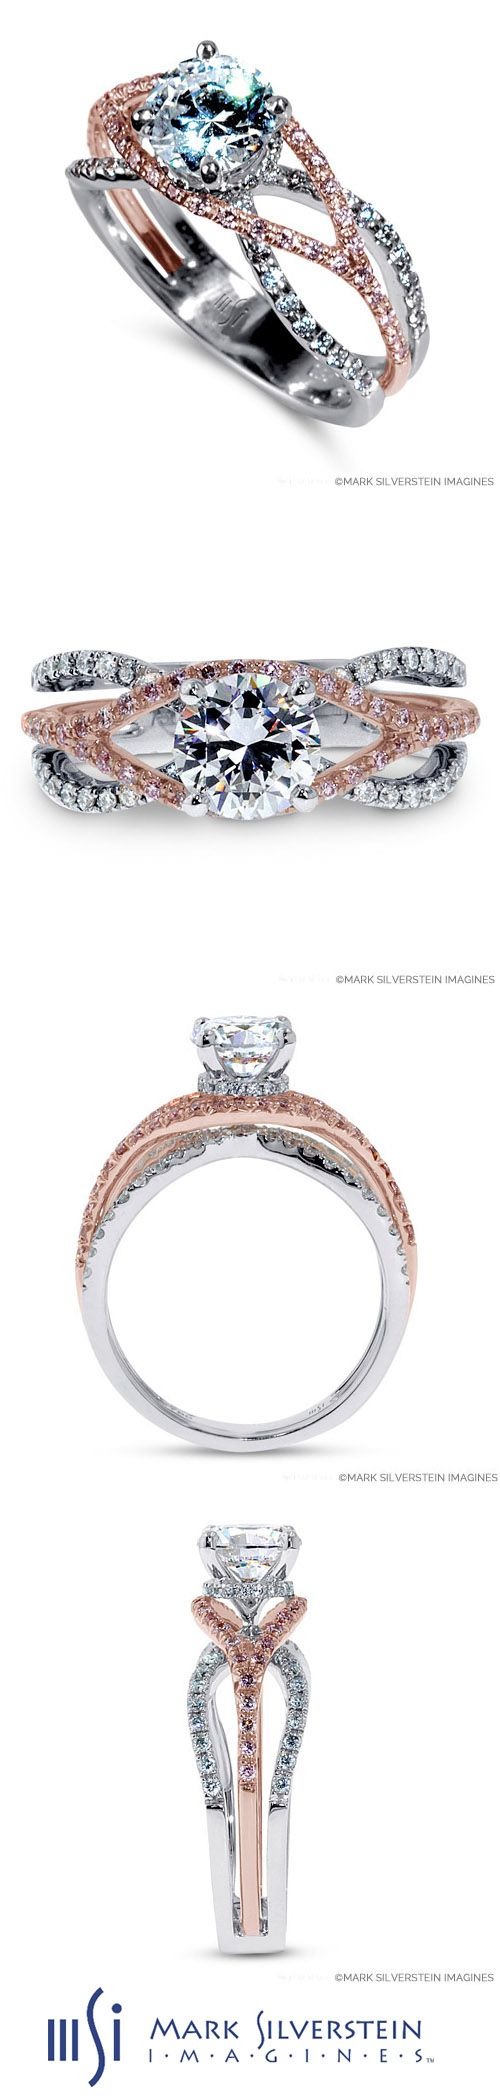 best 25+ popular engagement rings ideas only on pinterest